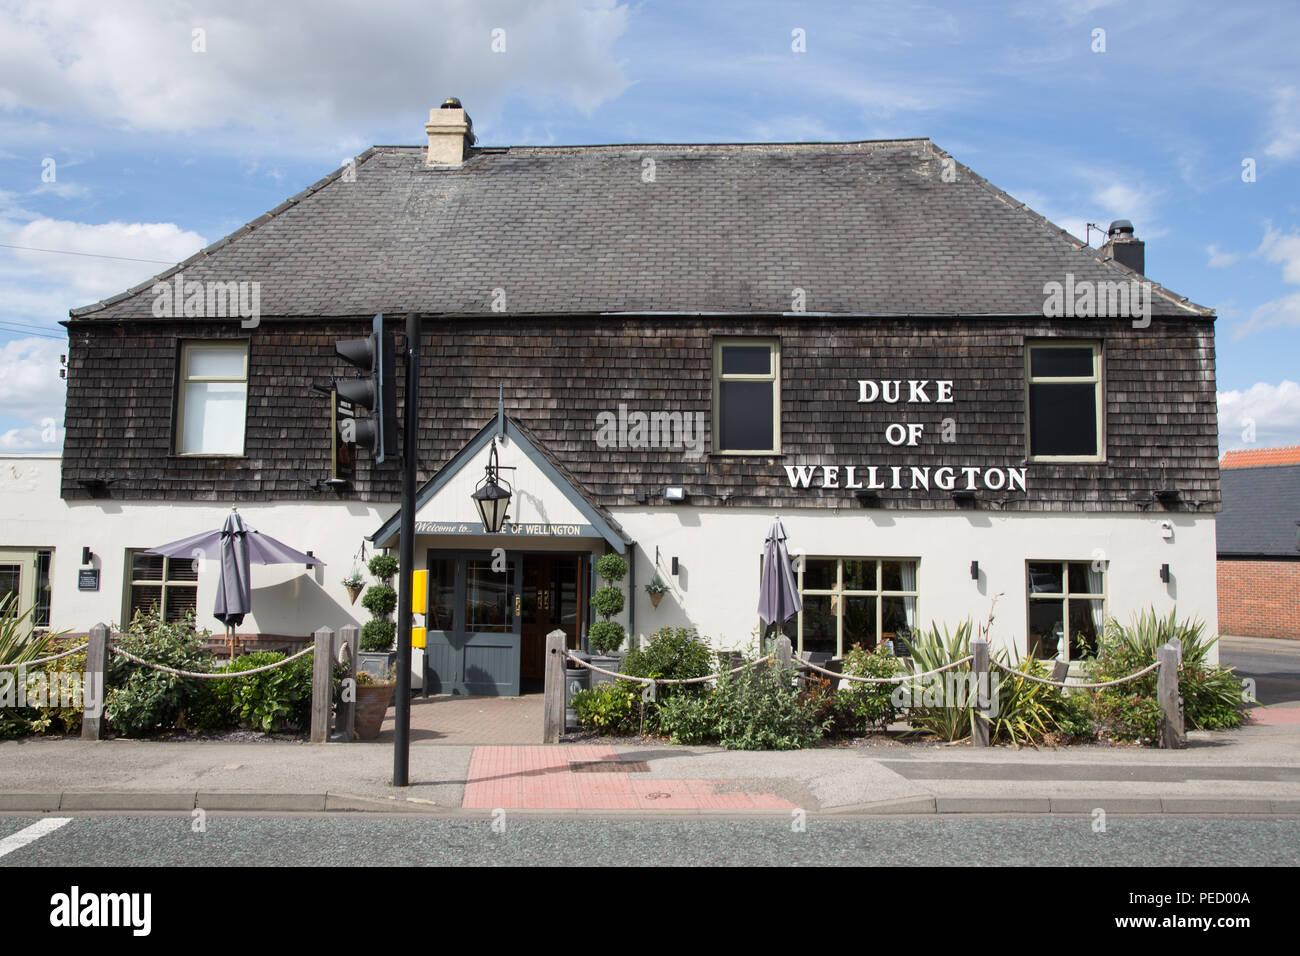 Duke of Wellington English pub/restaurant in Durham, County Durham, England. - Stock Image